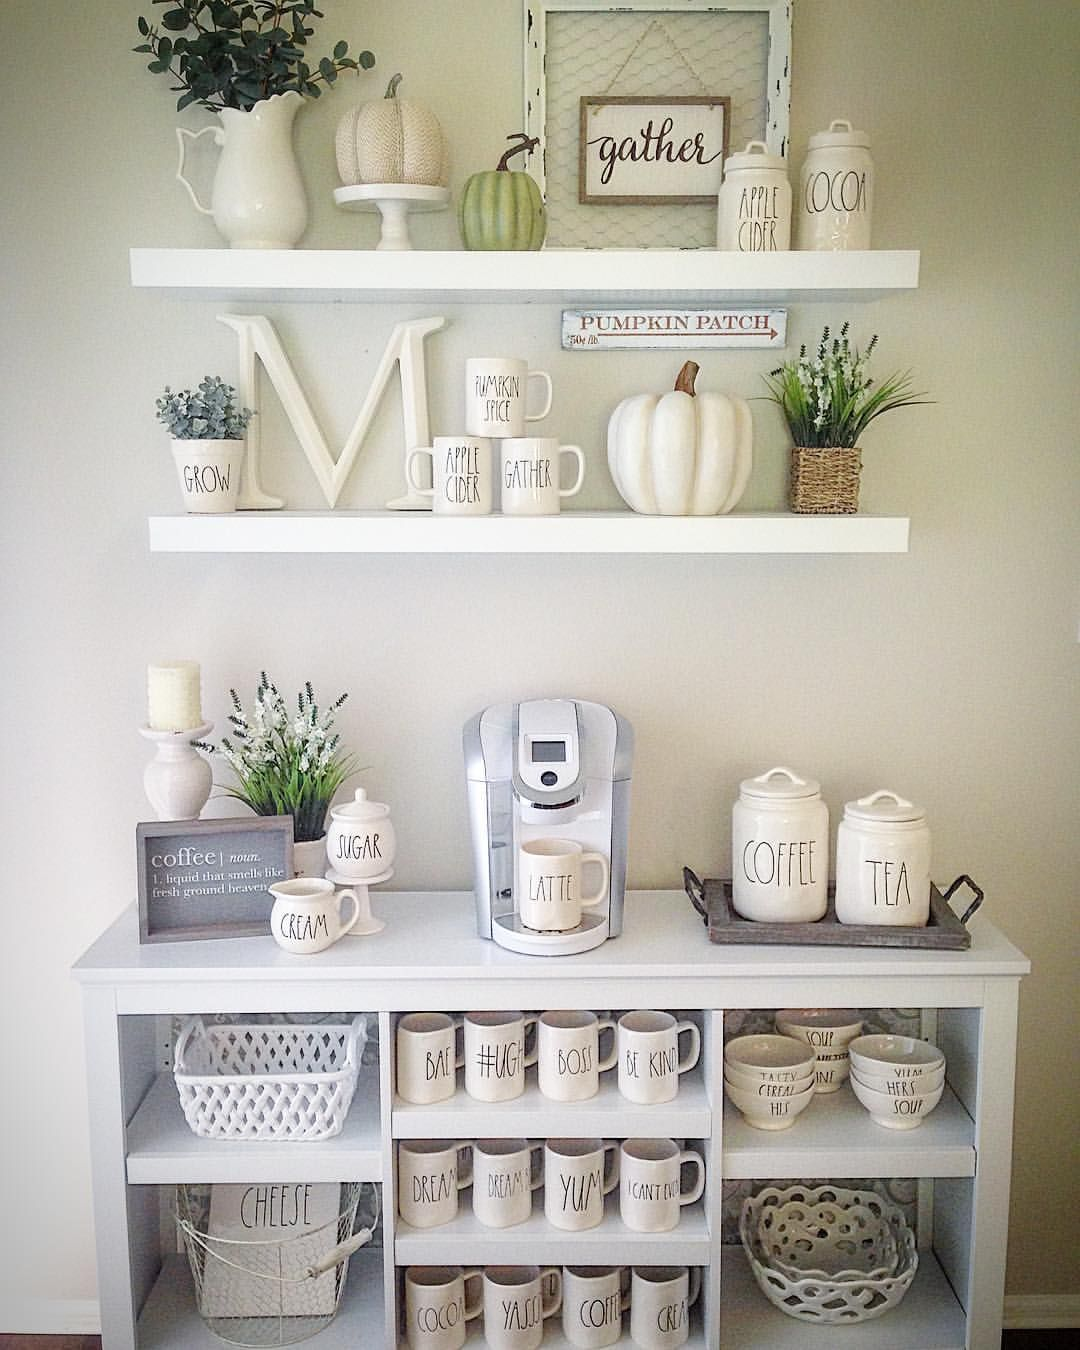 Home Sweet Homedecor Mug Display Farmhouse Shelves Rae Dunn Mugs Canister Target Bookcase Coffee Bar